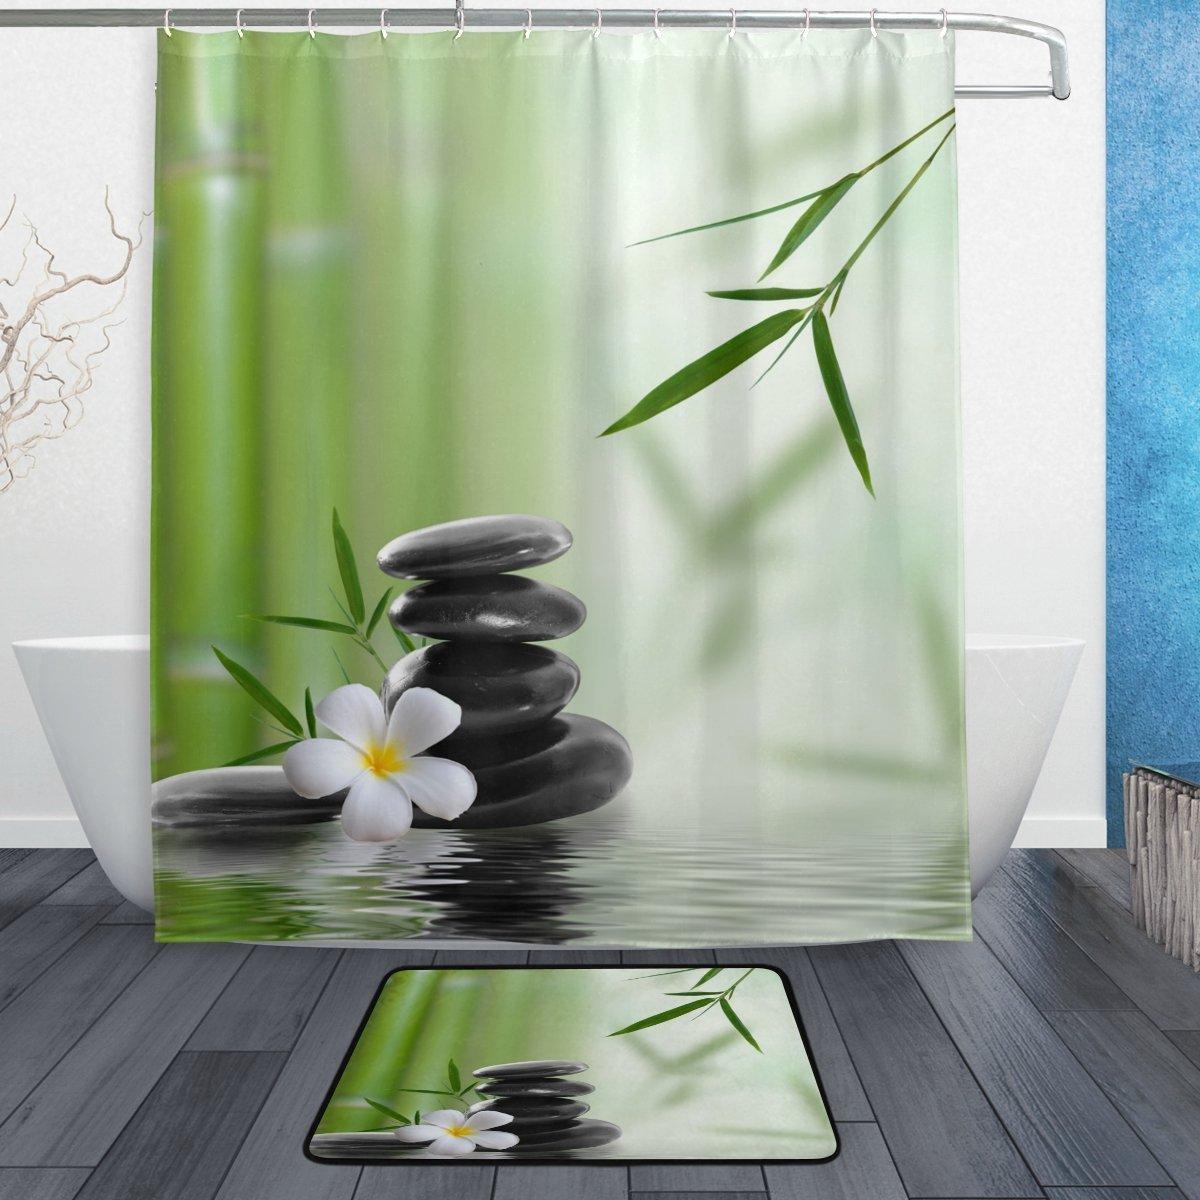 Green Shower Curtain Vintage Zen Asian Bamboo Print for Bathroom